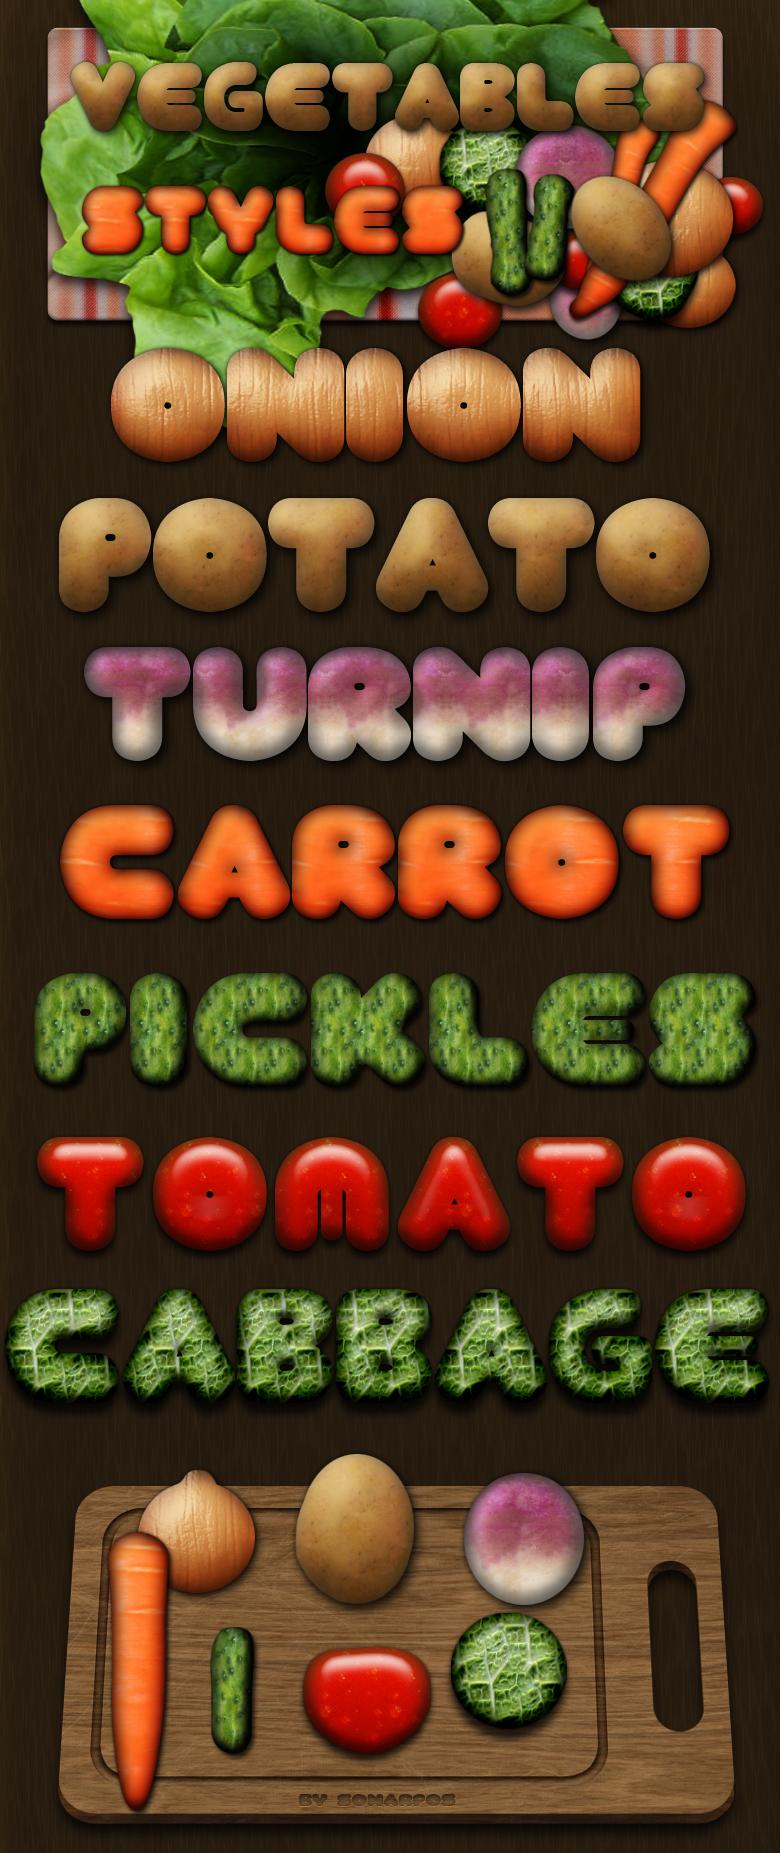 Vegetables styles